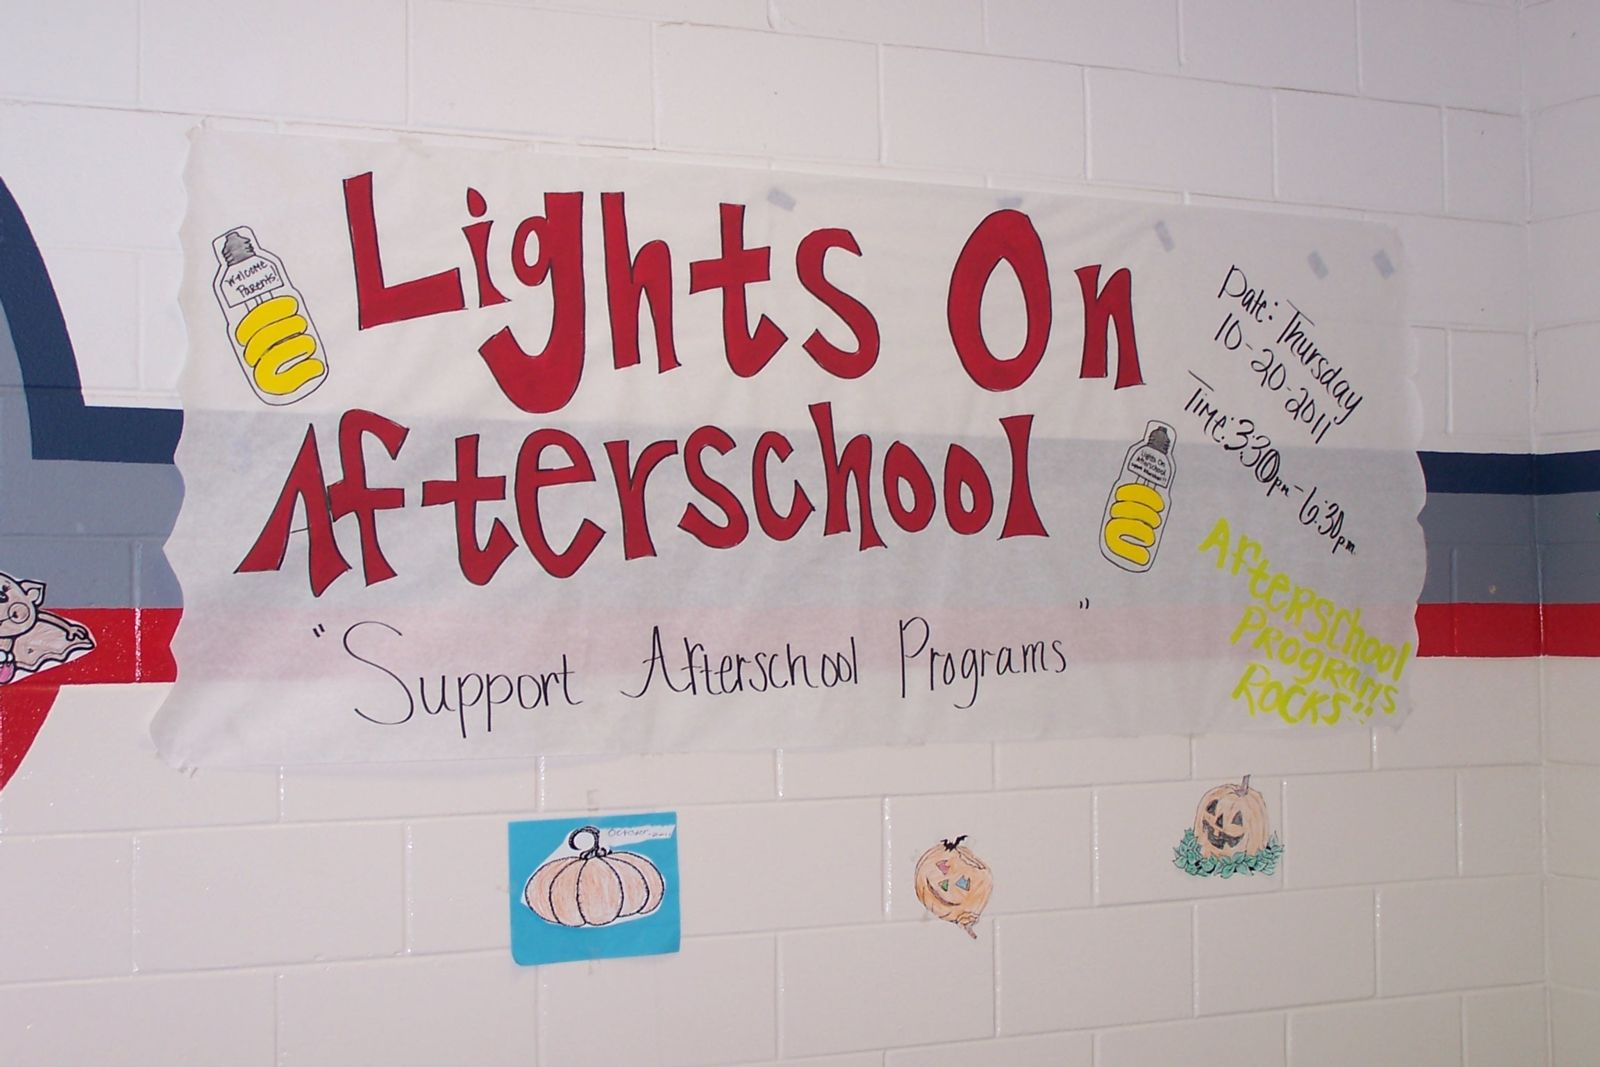 10 Stunning Ideas For After School Programs event ideas activities